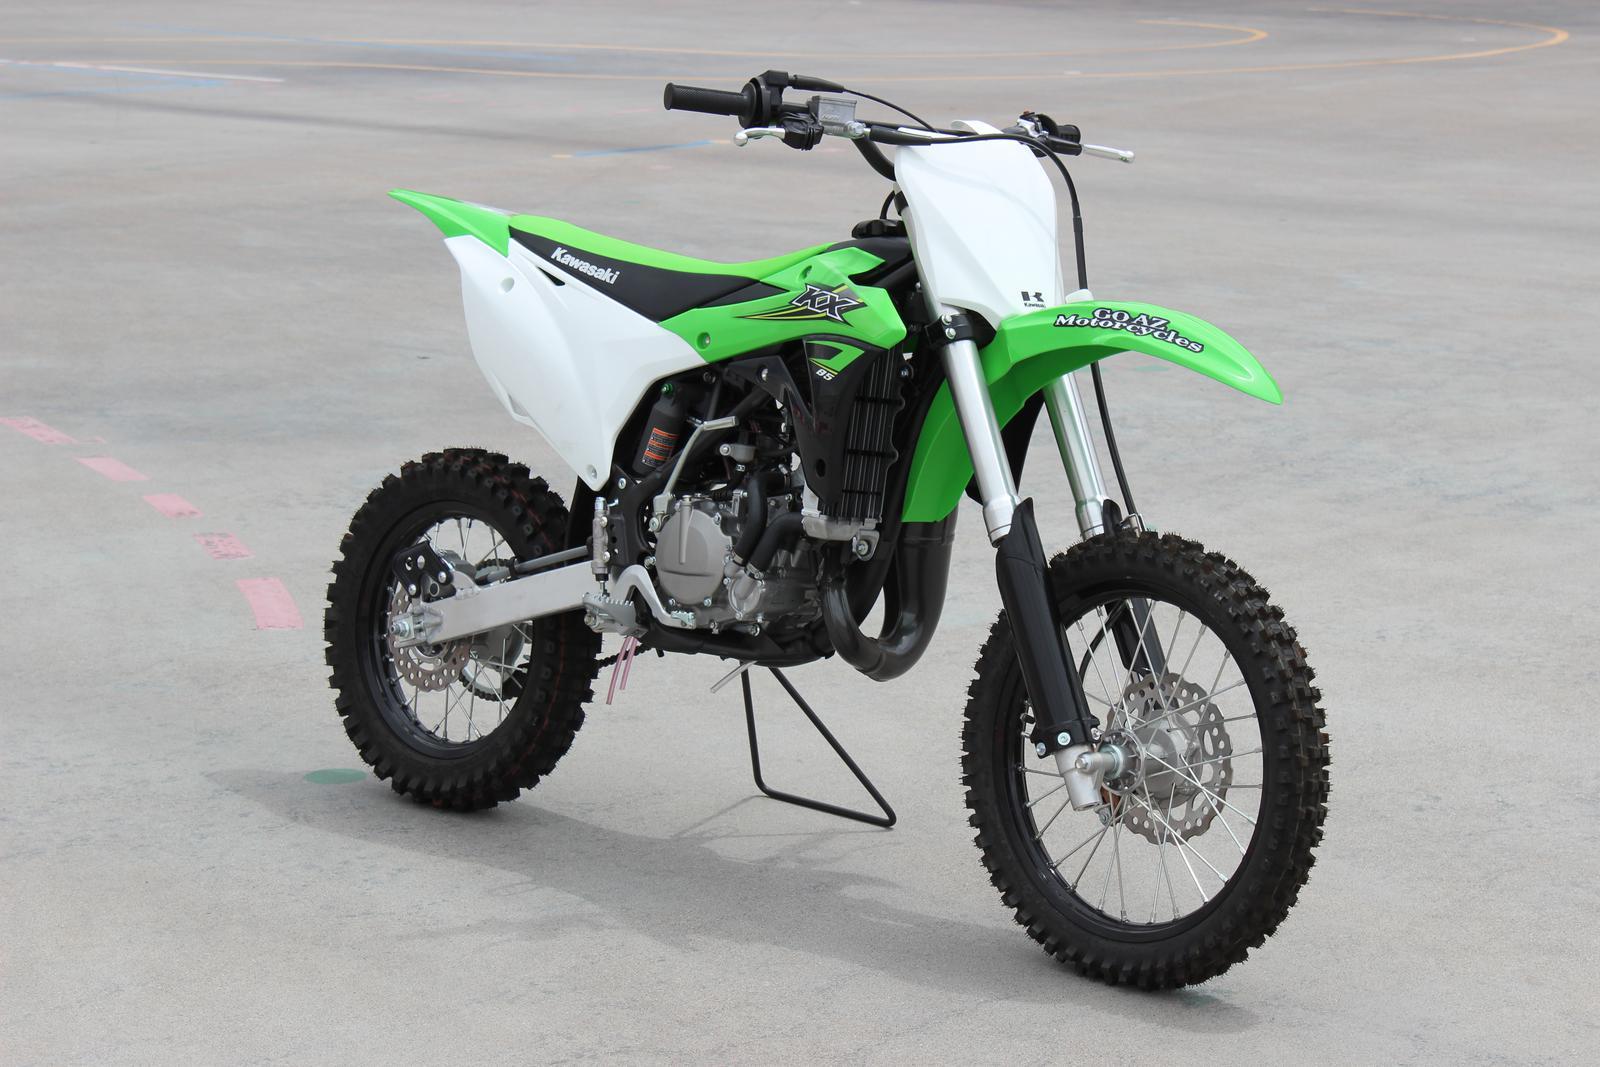 2017 Kawasaki KX 85 for sale in Scottsdale, AZ. GO AZ Motorcycles in